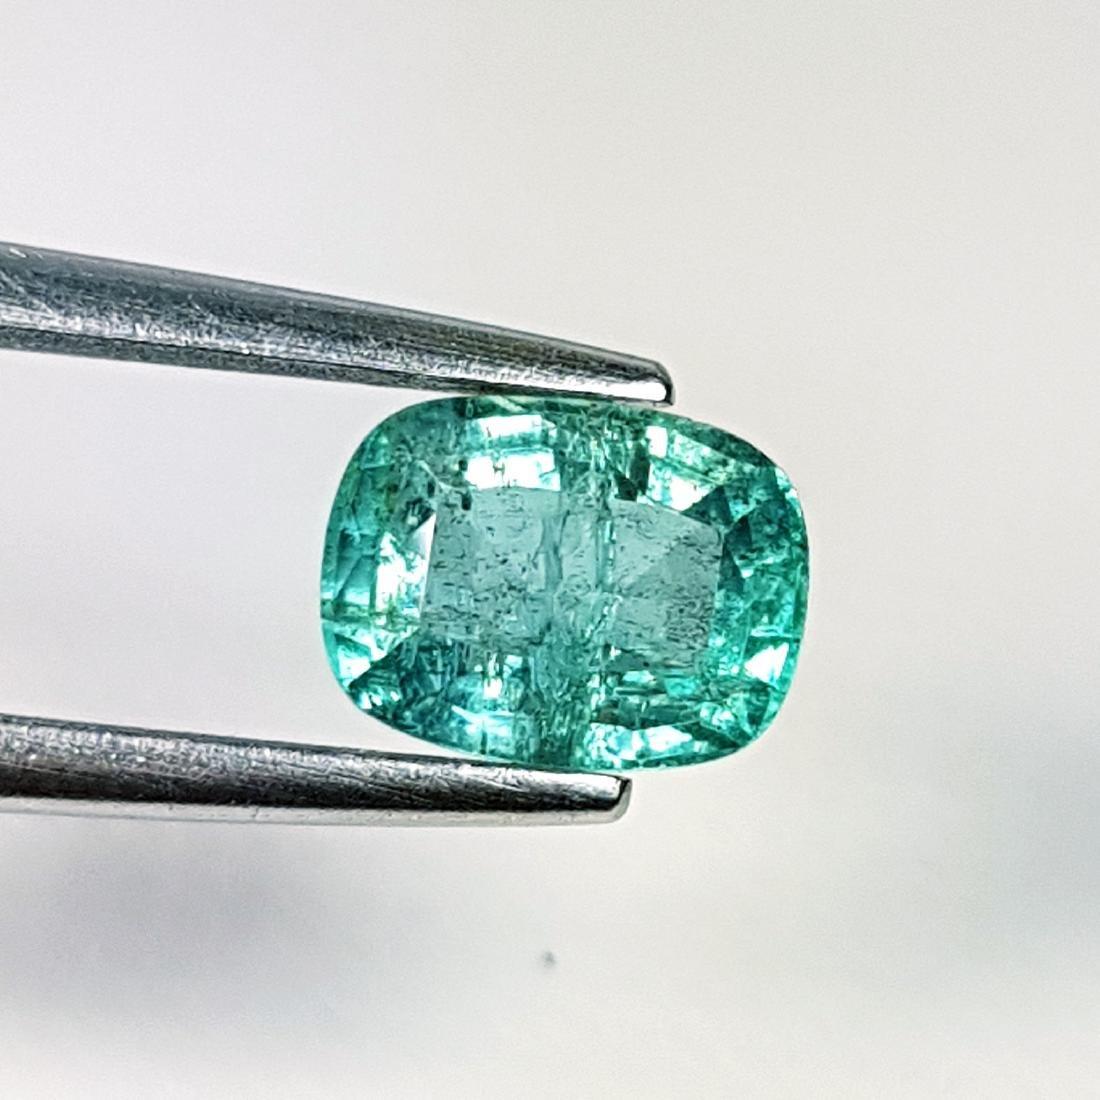 Emerald - 1.47